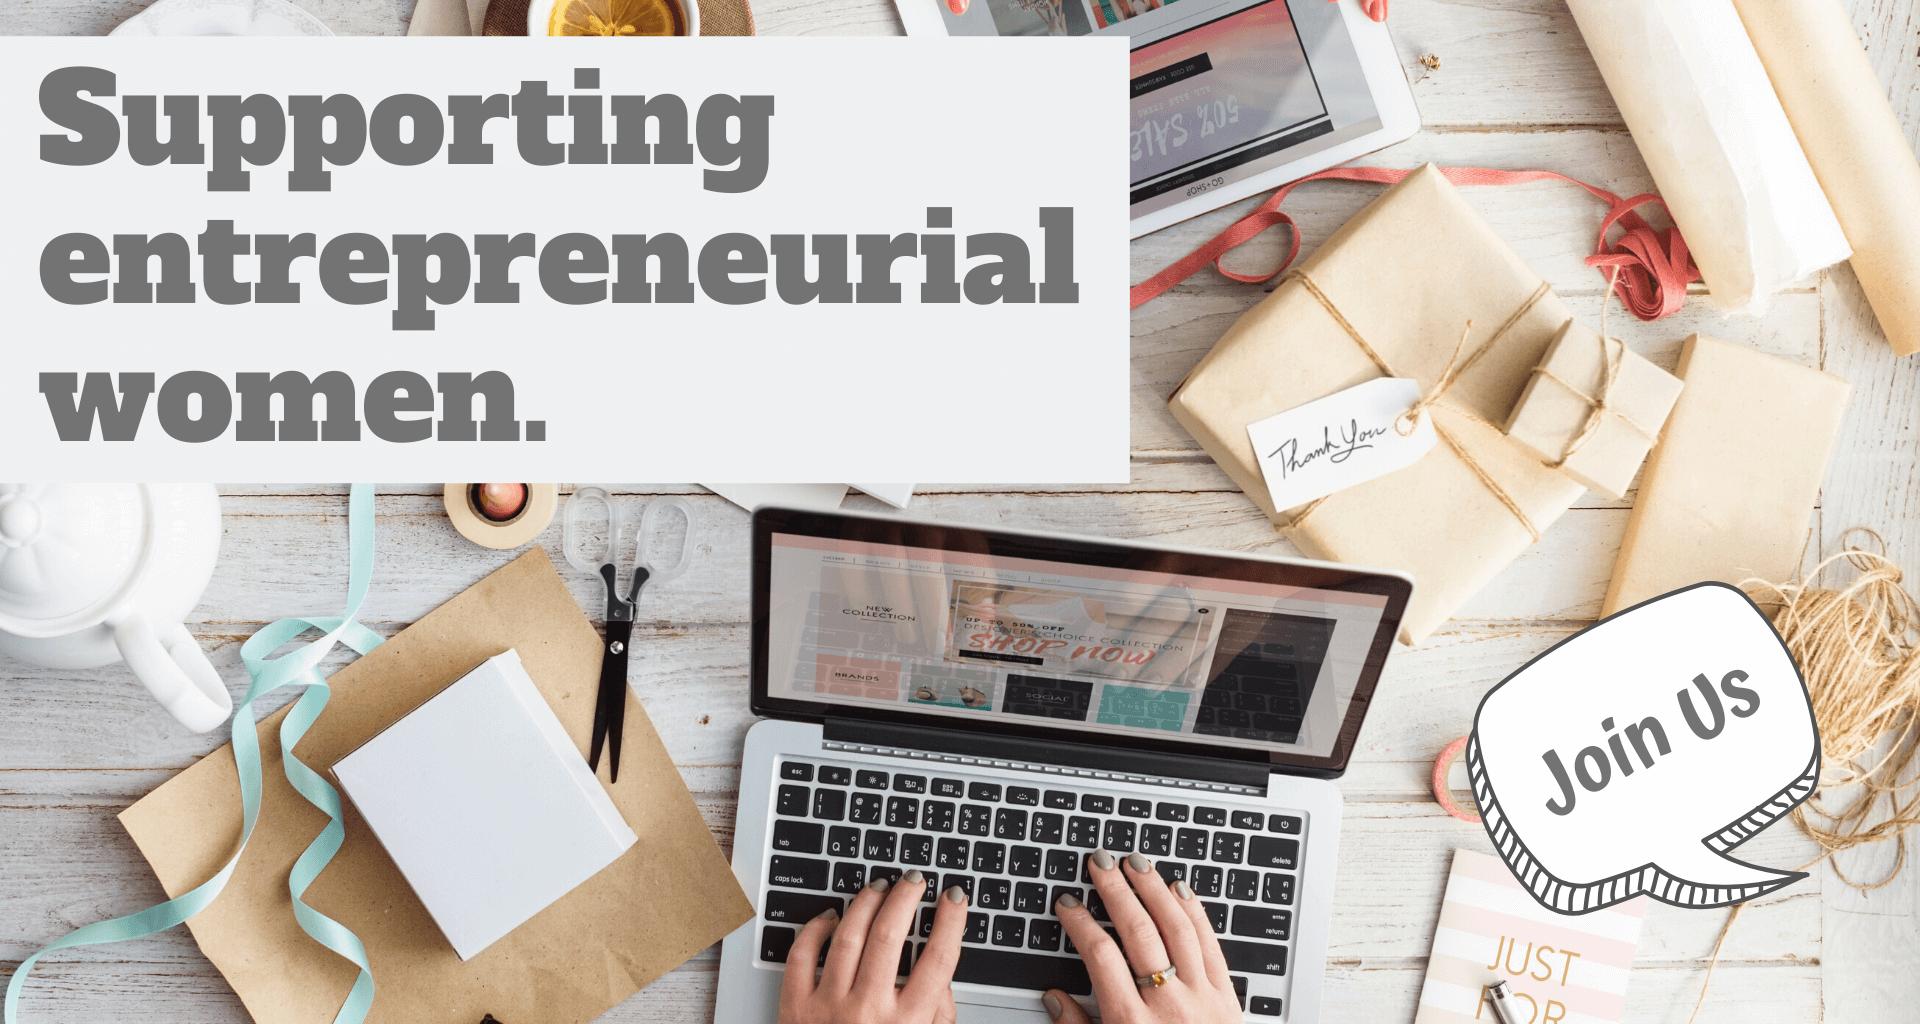 Supporting entrepreneurial women